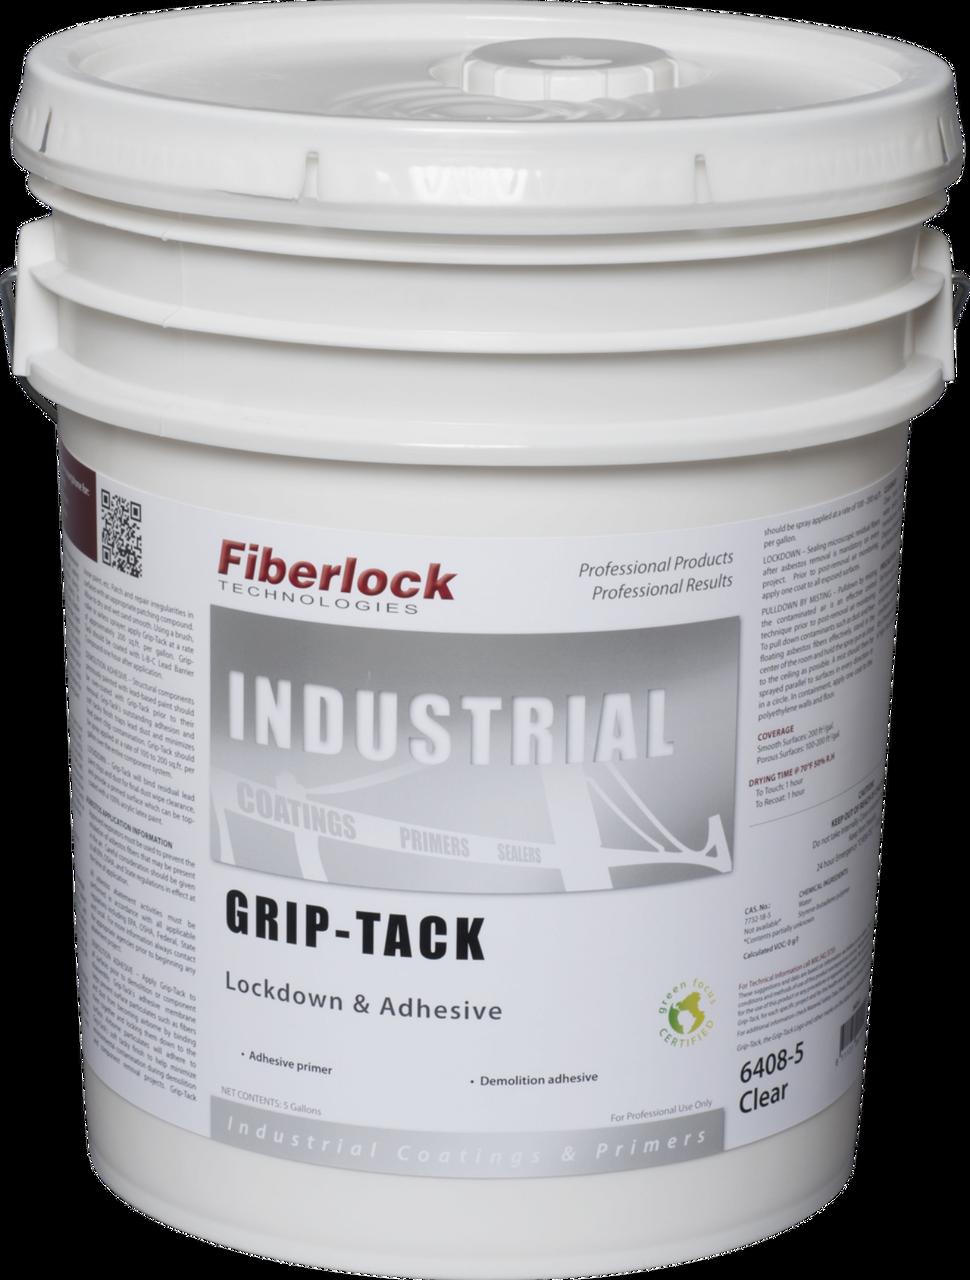 Grip-Tack - Lockdown Adhesive For Lead & Asbestos: 6408